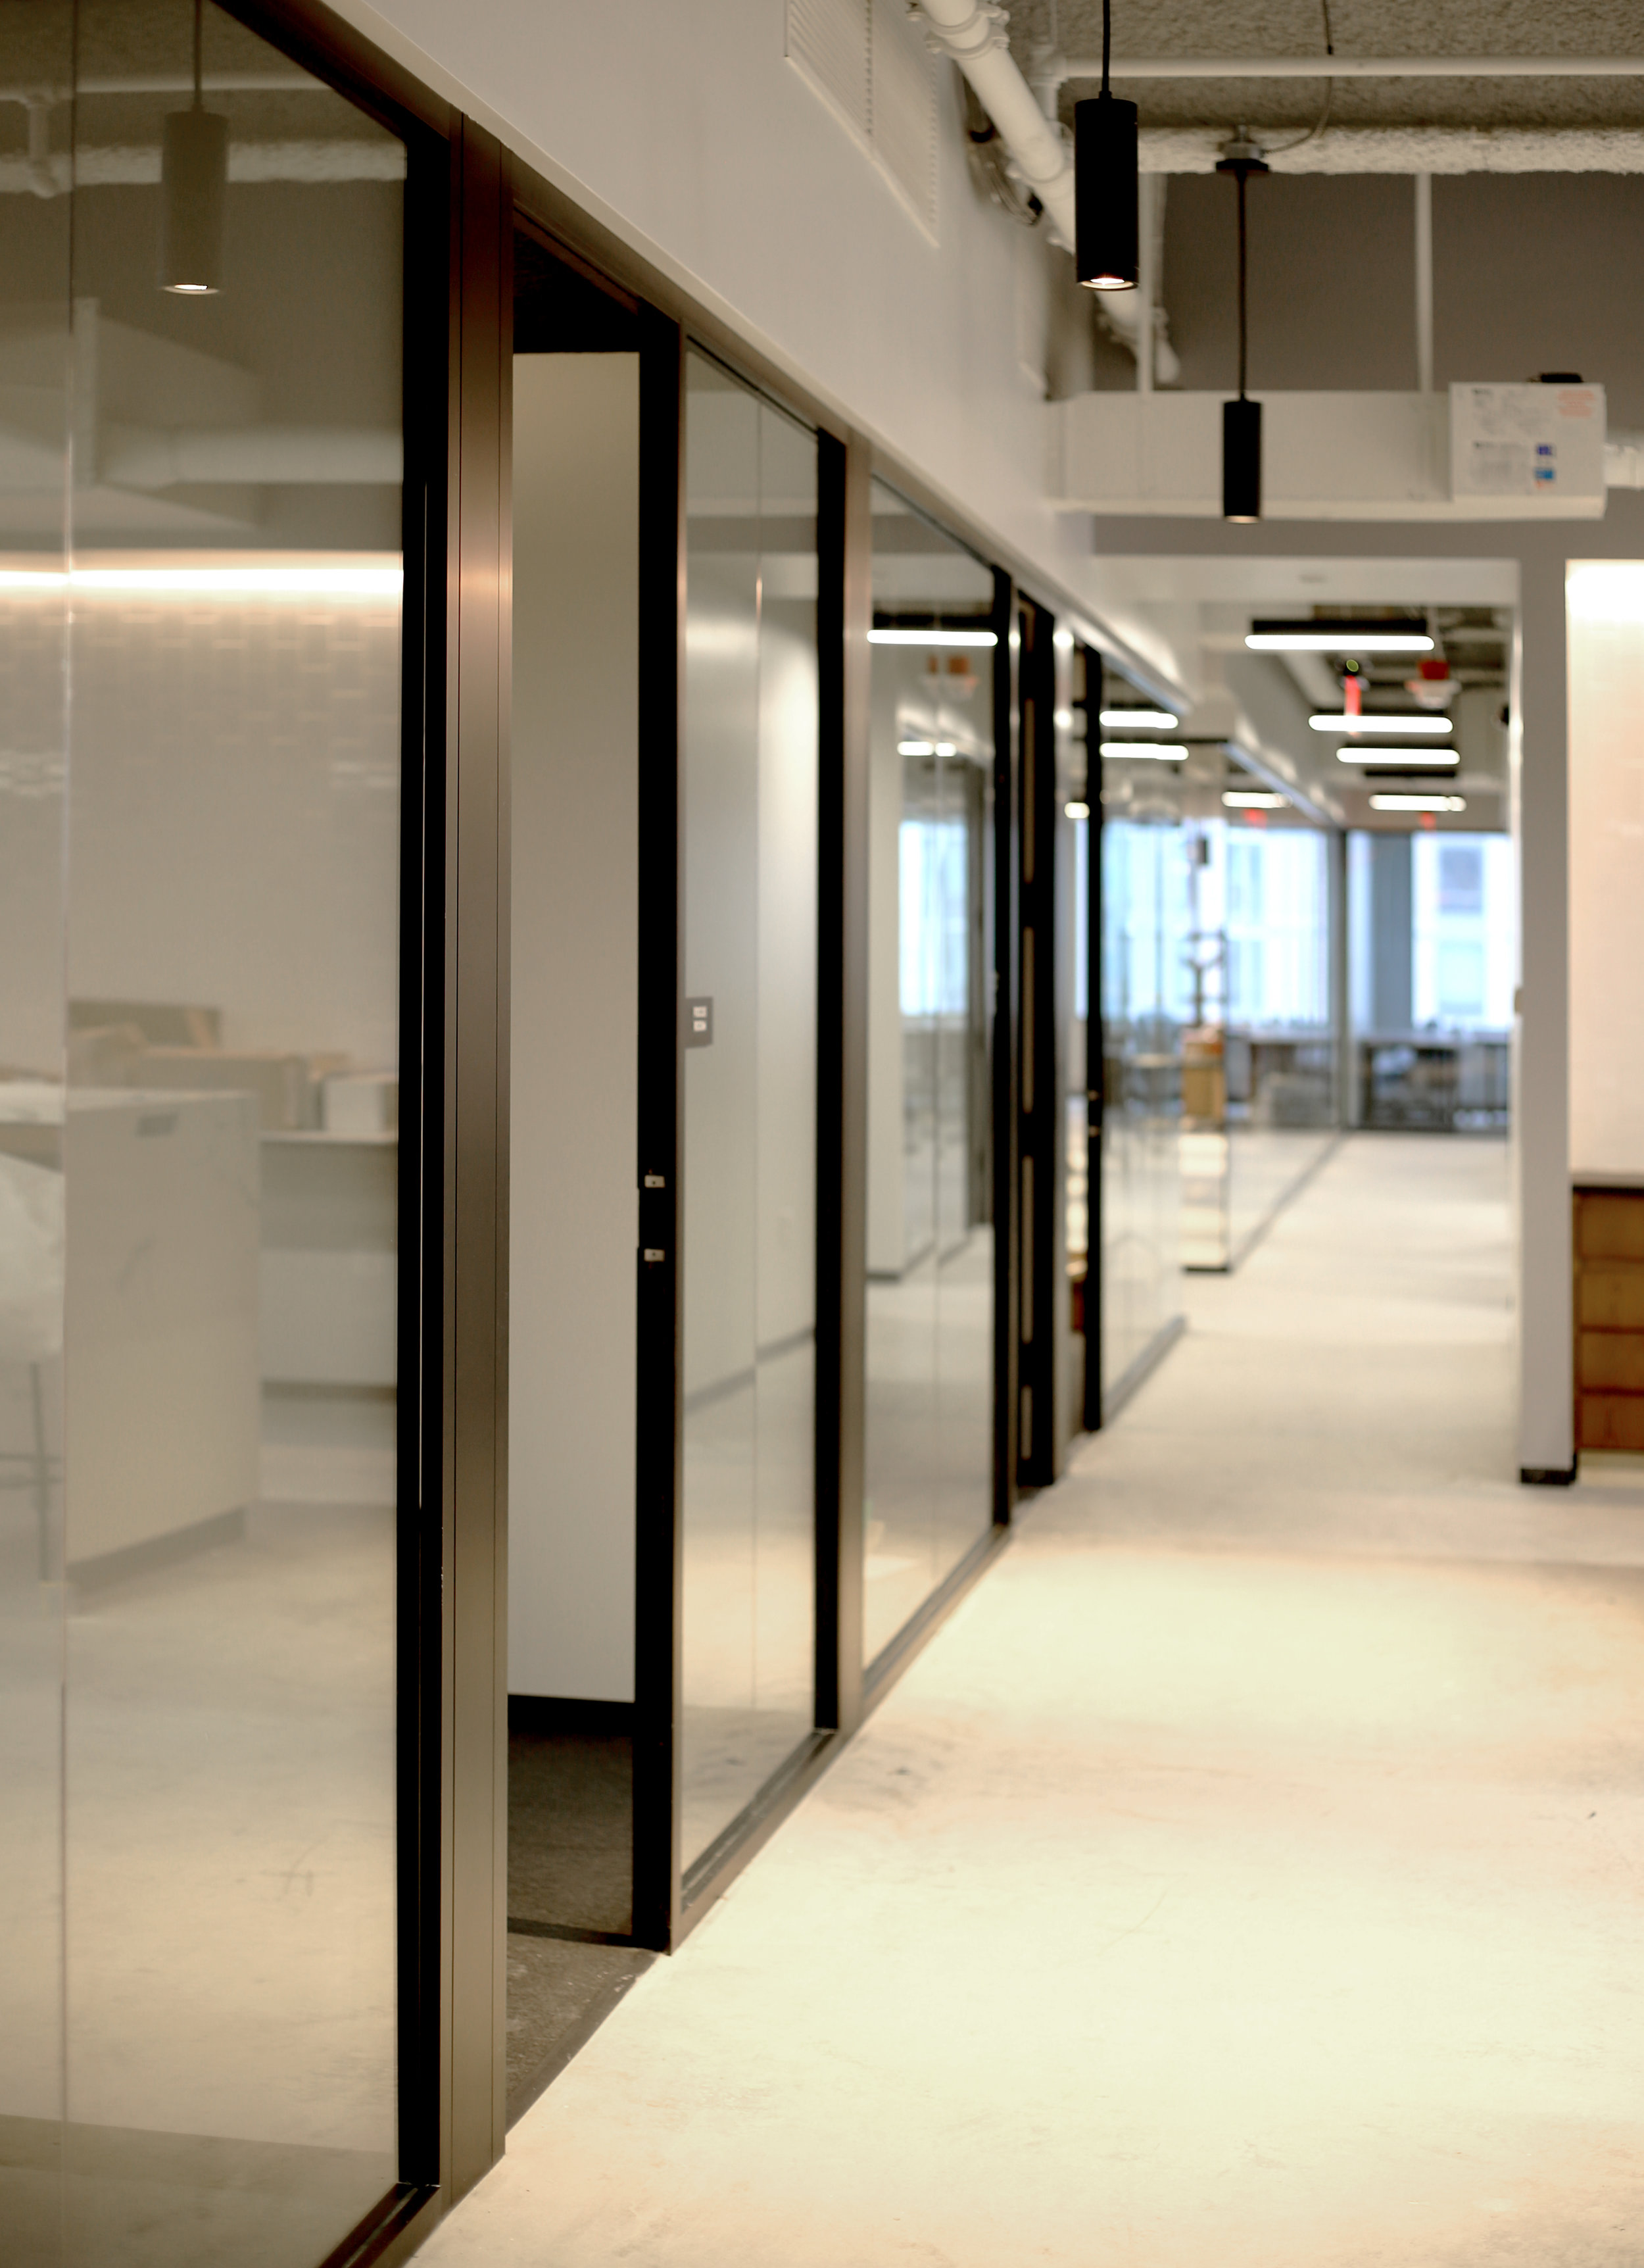 Litespace Black Demountable Aluminum Framed Office Fronts - Spaceworks AI.jpg